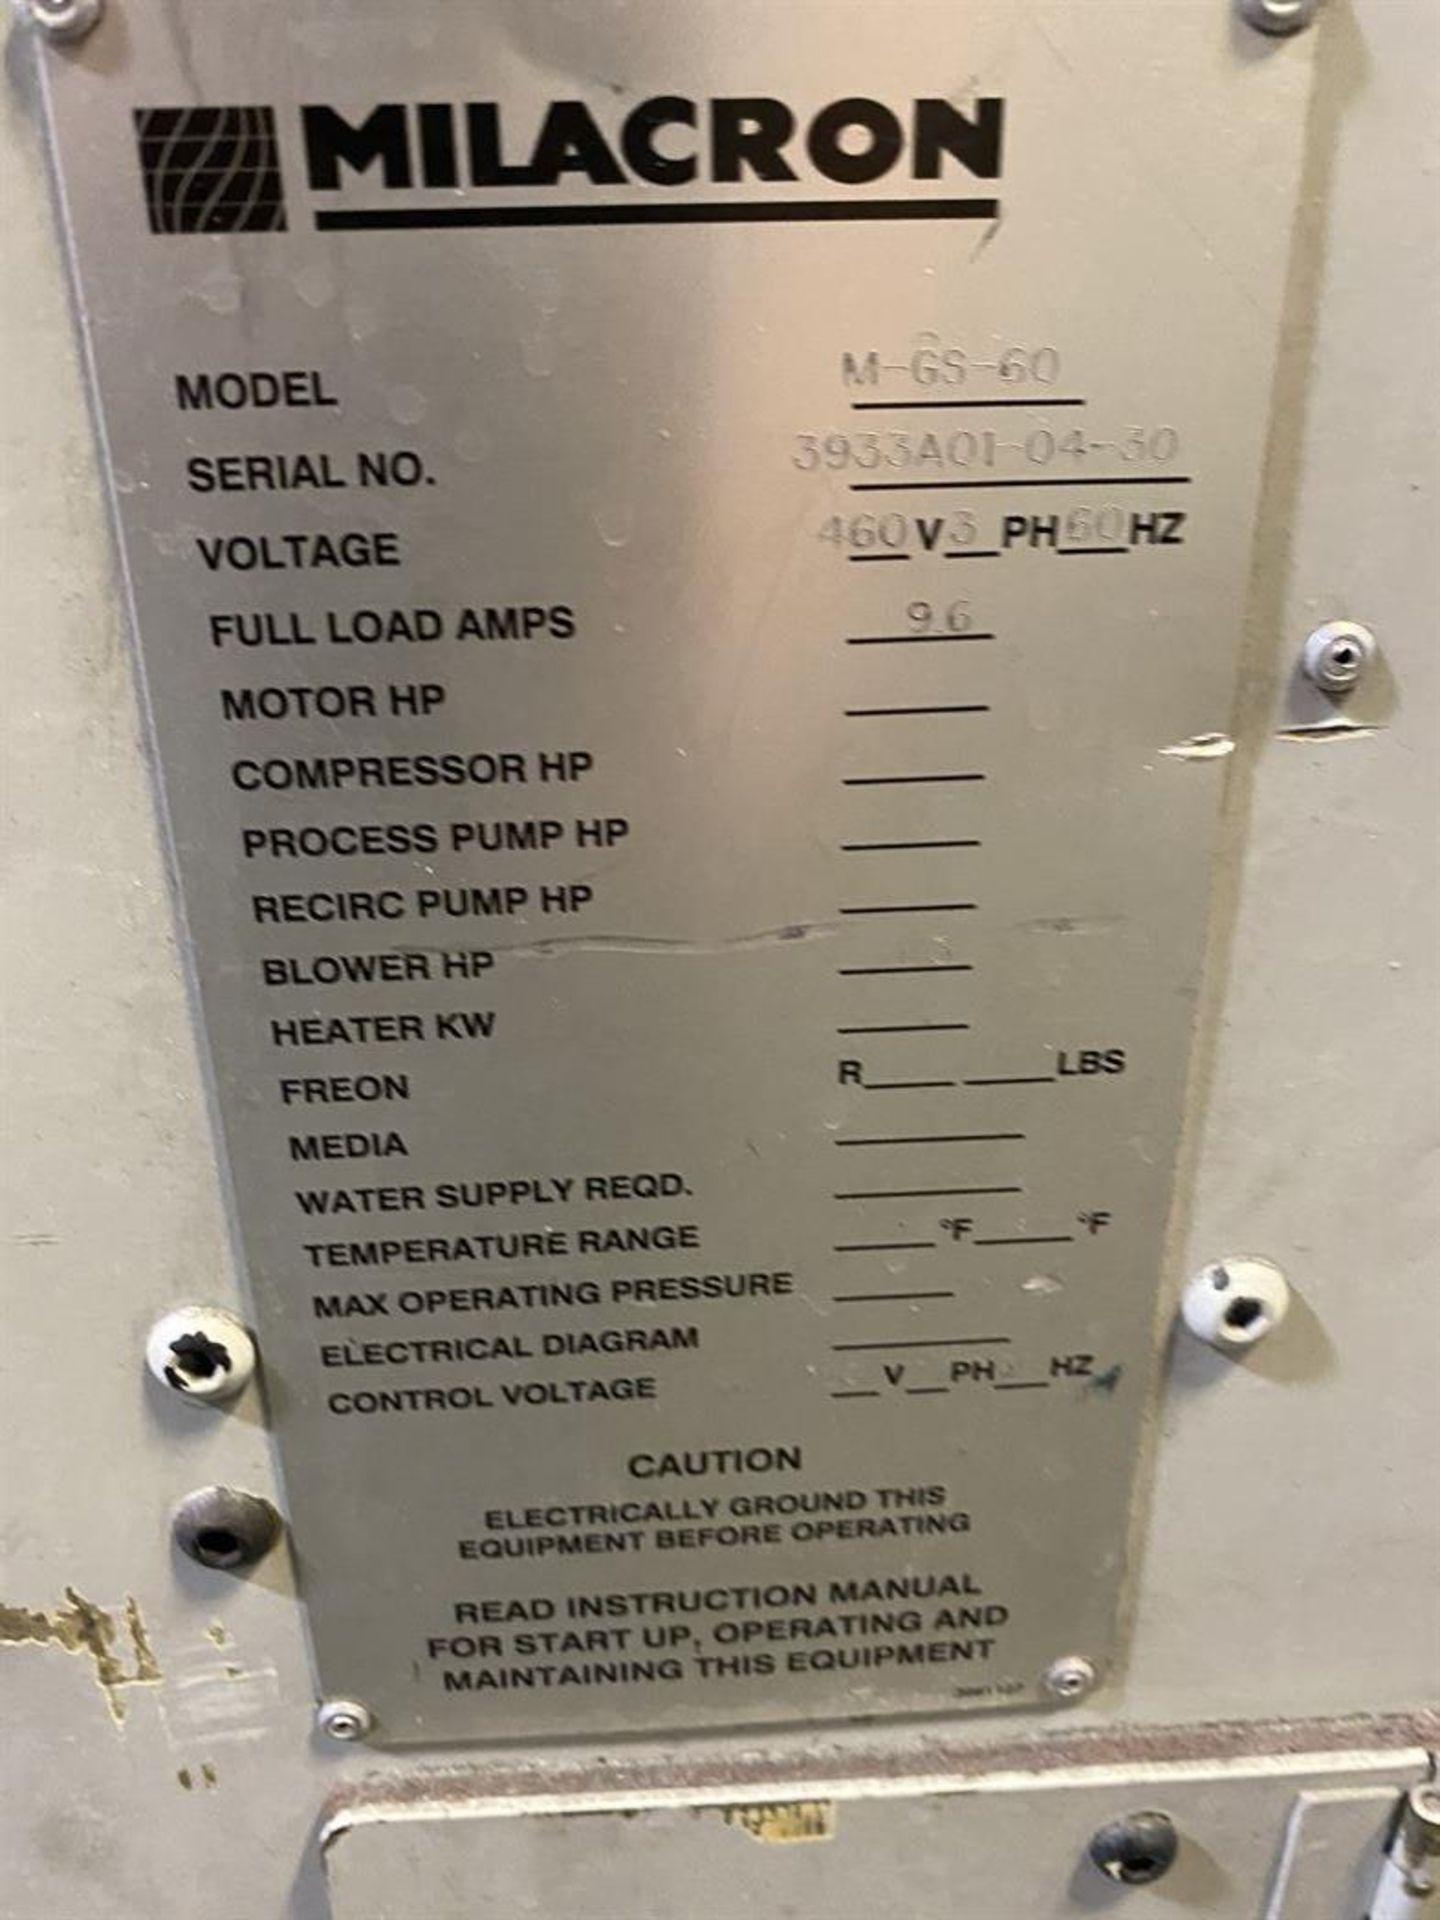 Lot 221 - Cincinnati Milacron M-GS-60 Hopper Dryer System, s/n 3933A01-04-30, w/ Vacuum Loader